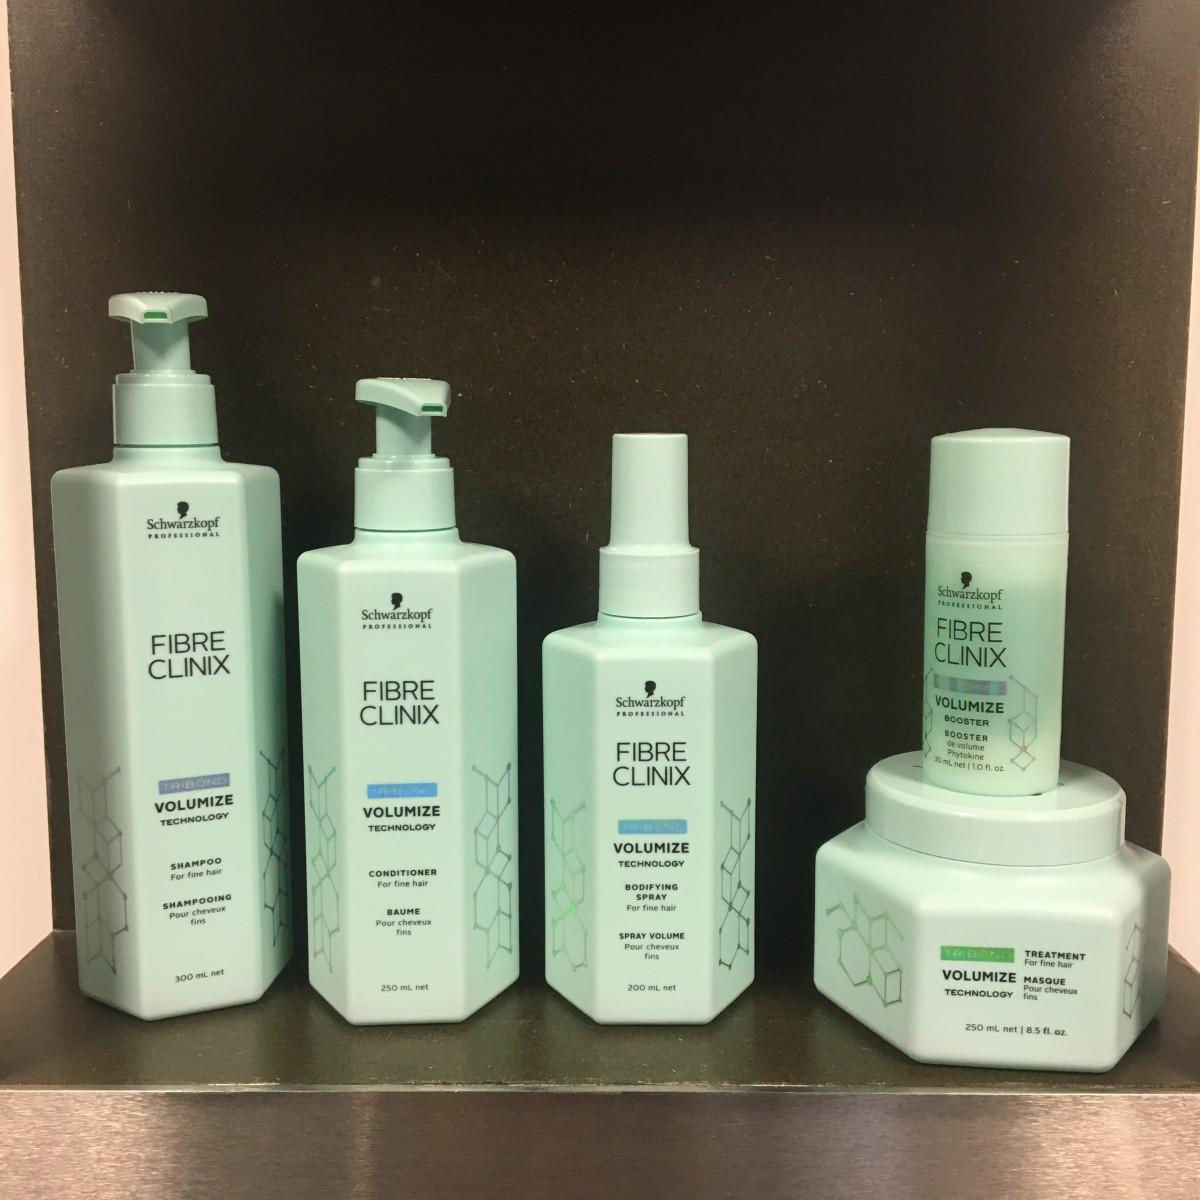 Fibre clinix Volumize- Fijn haar